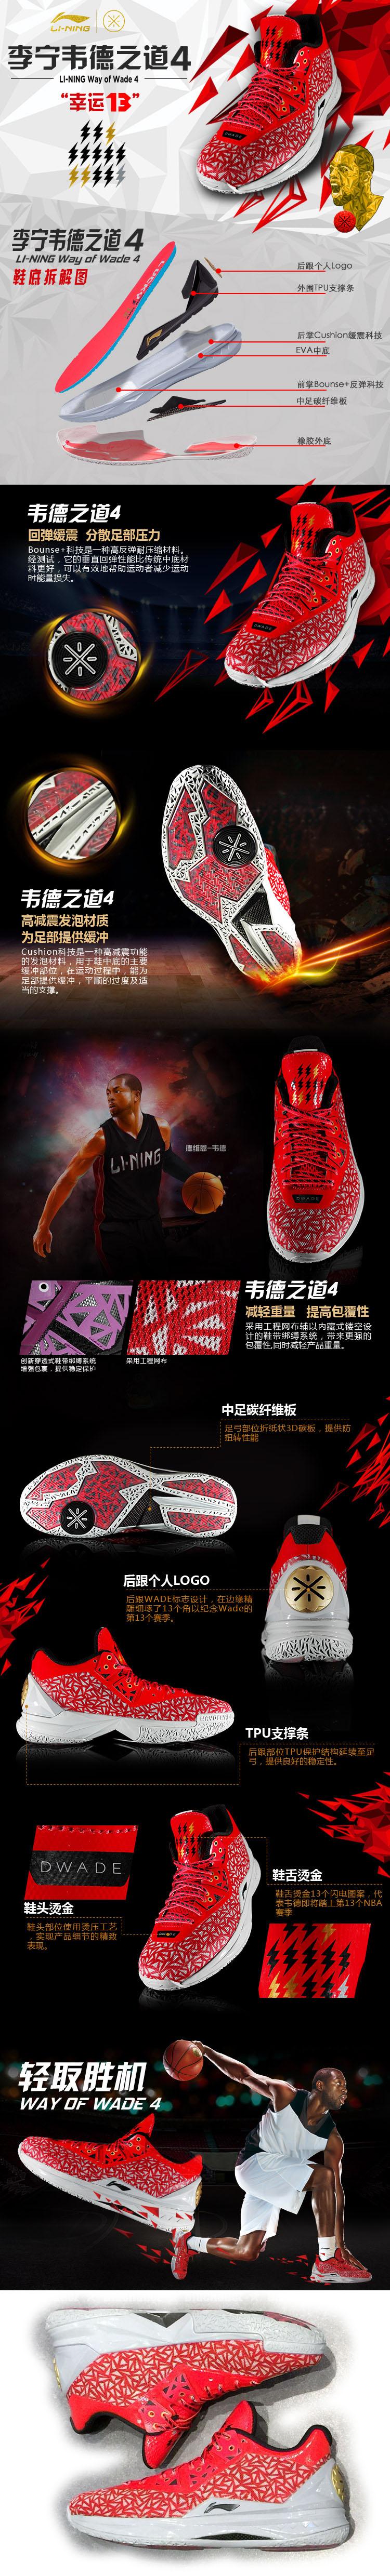 "Li-Ning WoW4 Way of Wade 4 ""Lucky 13"" Premium Basketball Shoes"